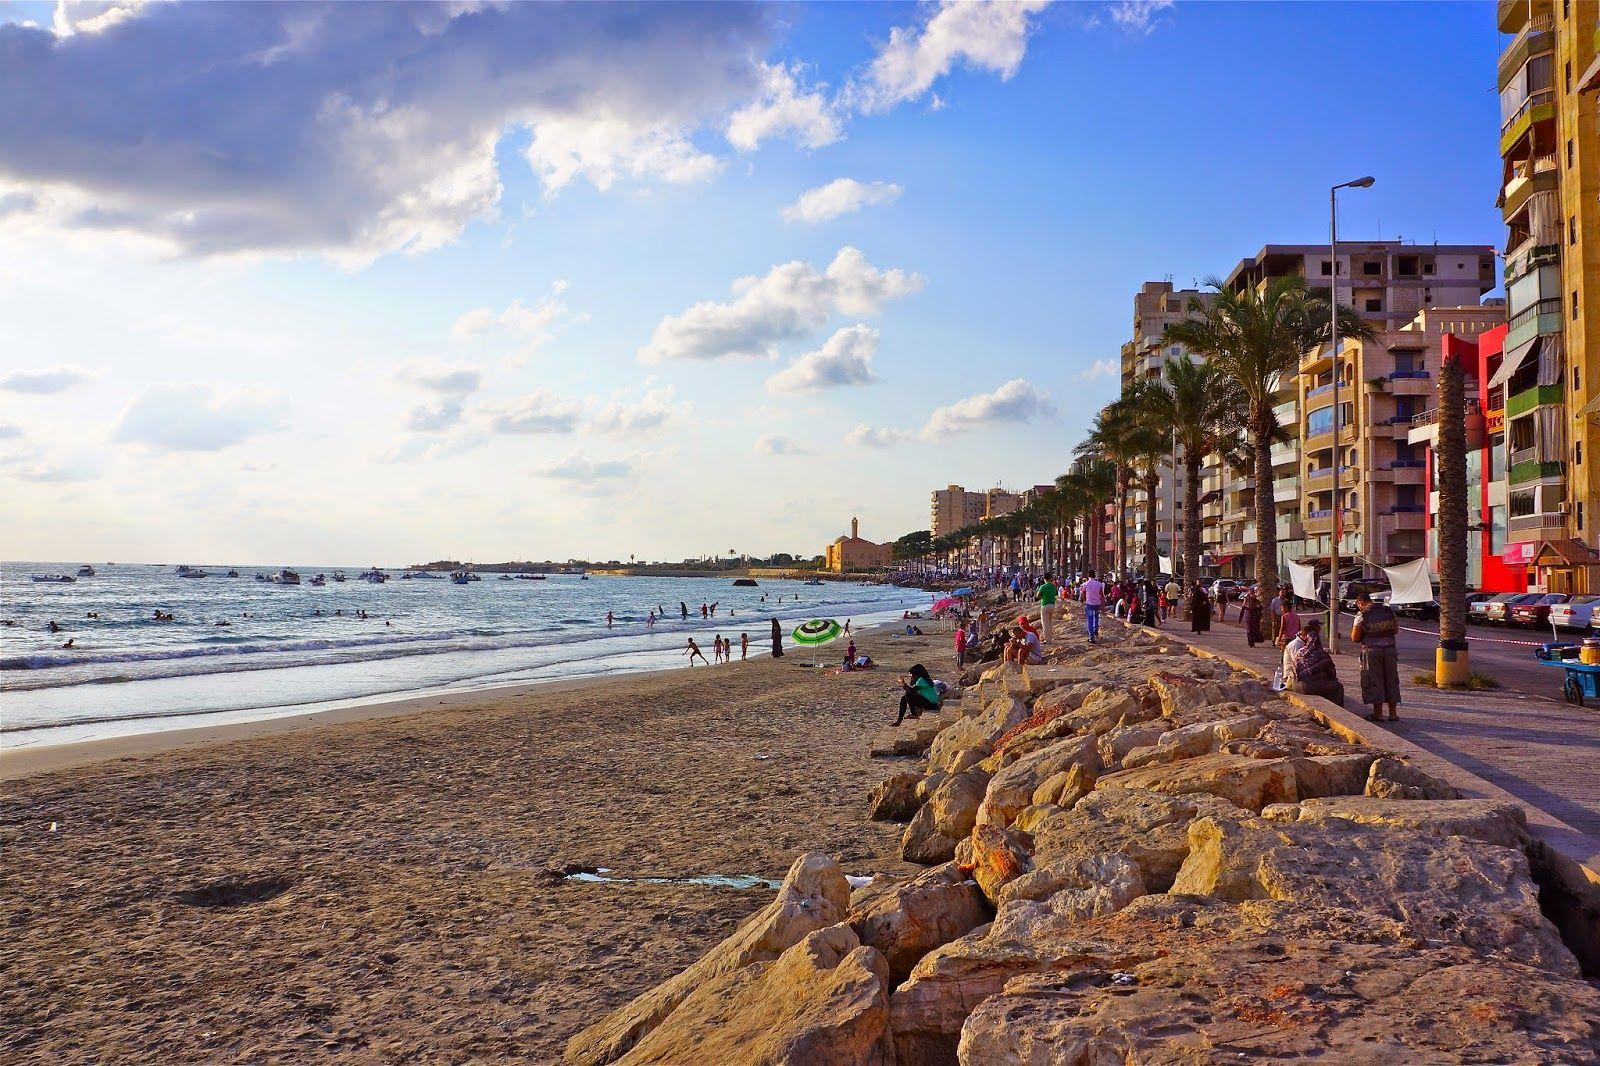 Tyre, Lebanon |Photoblog On-The-Go | Best beaches to visit, Beaches in the  world, Thailand beaches